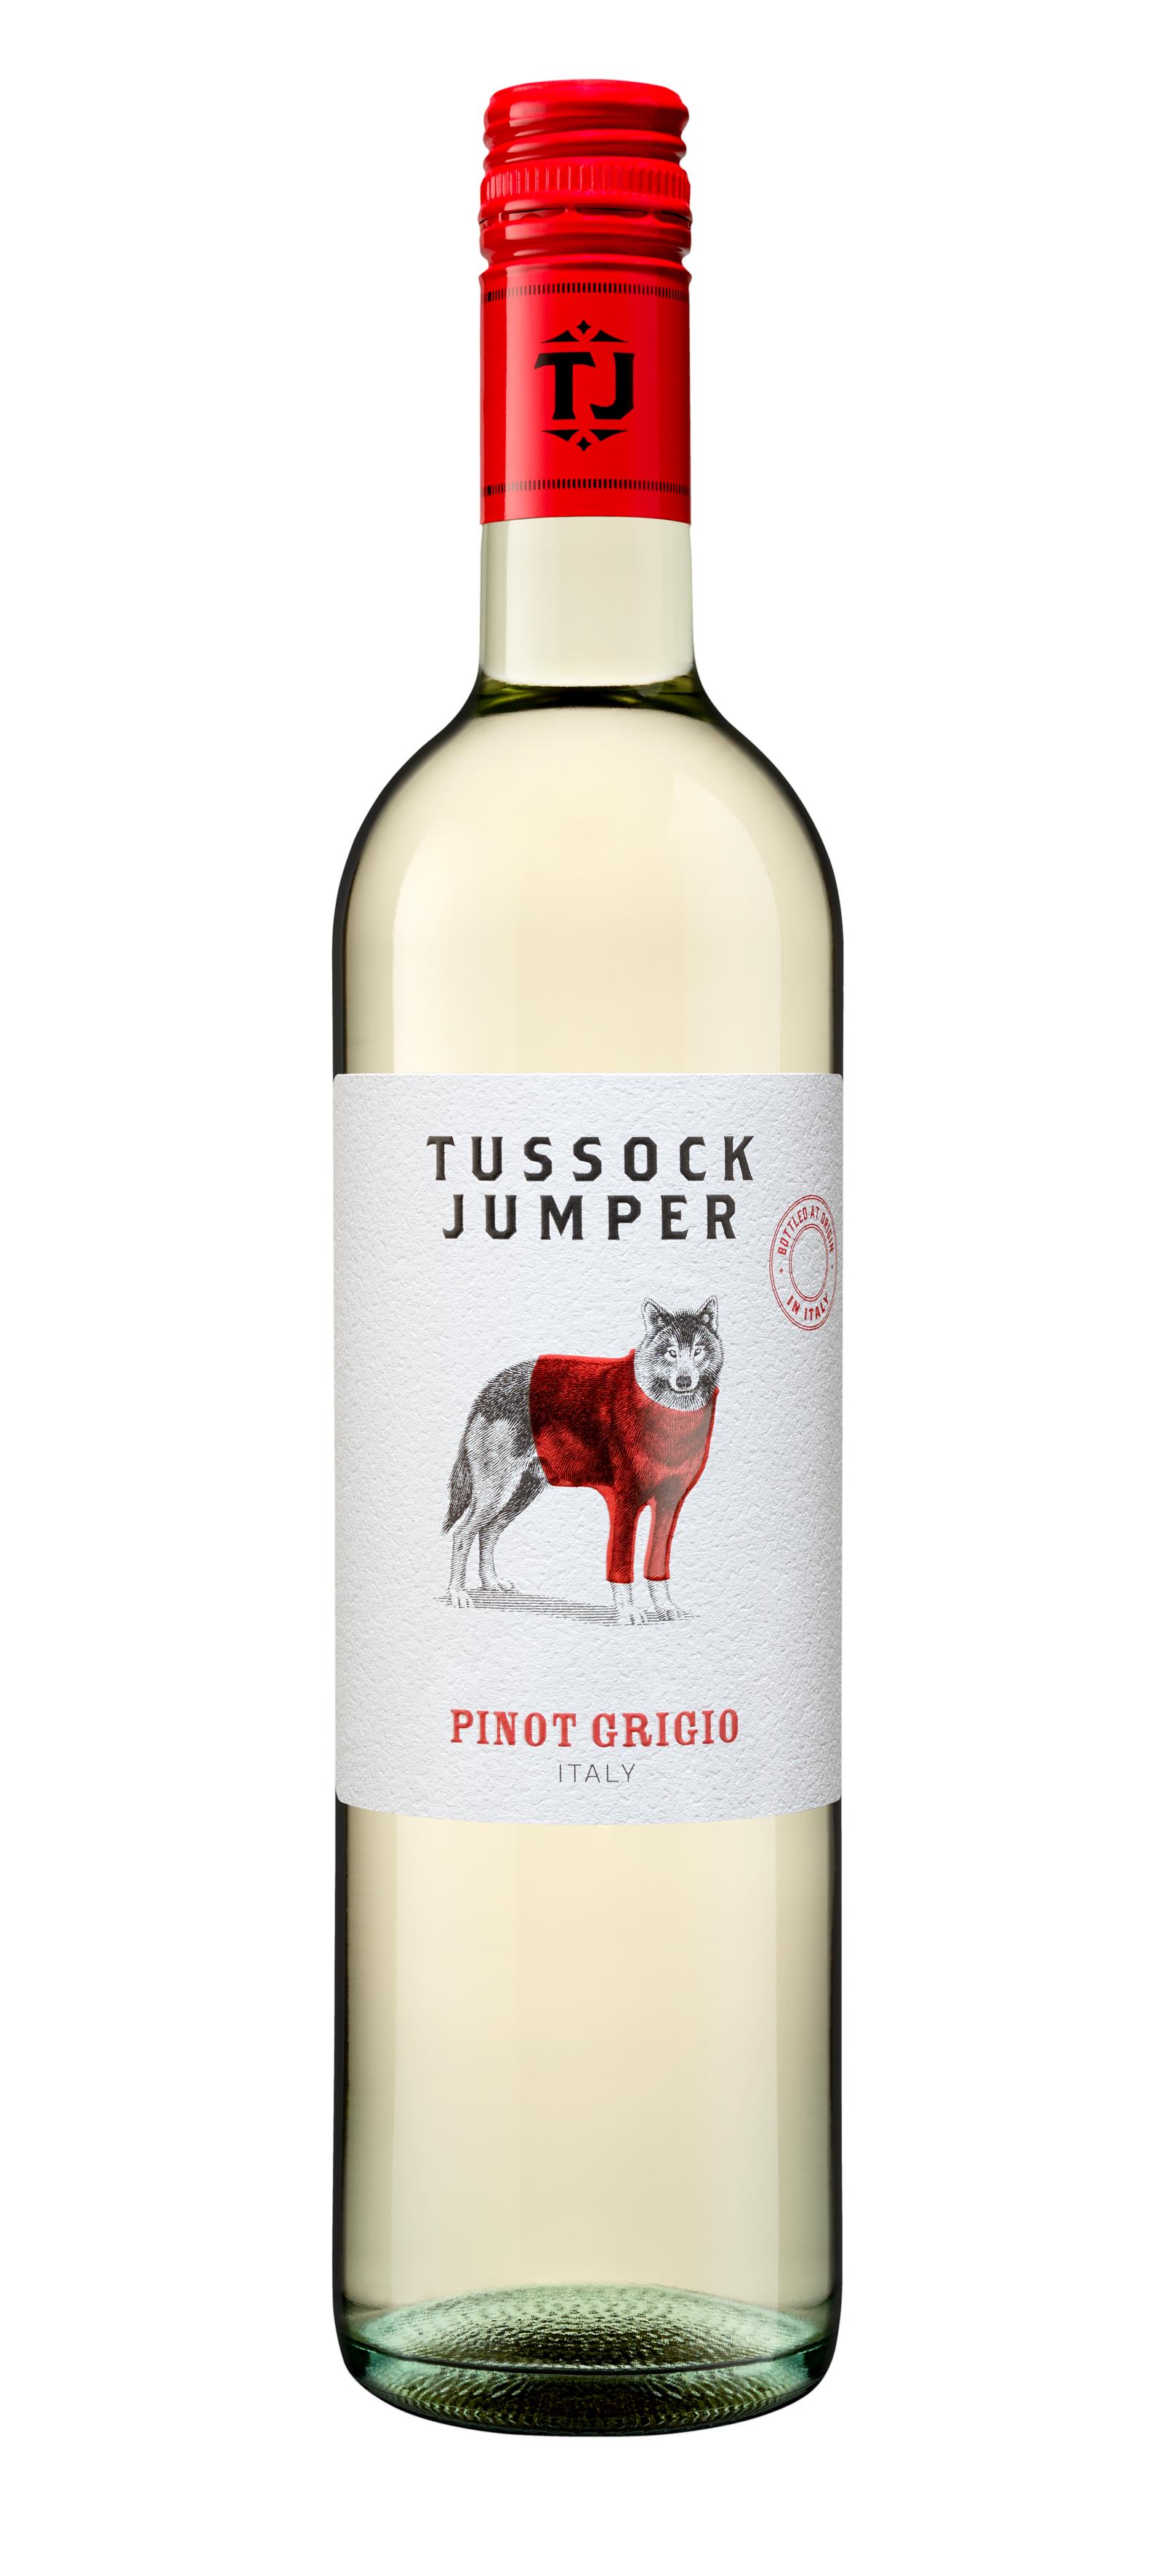 Tussock Jumper Pinot Grigio